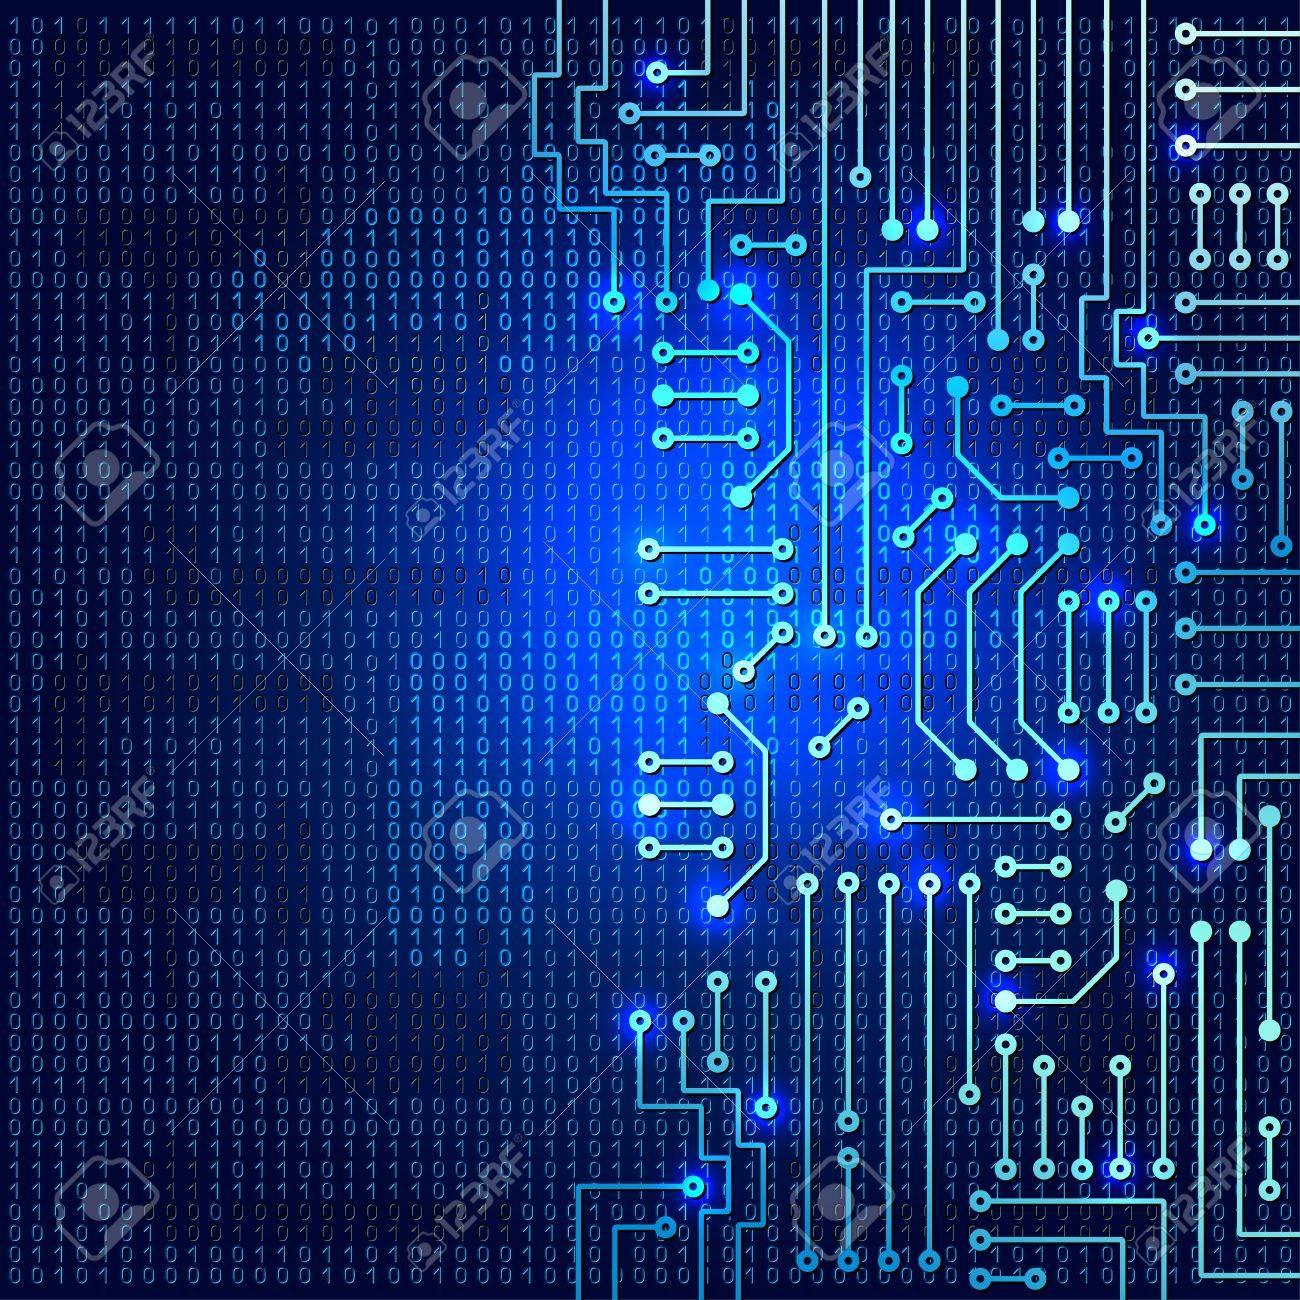 Circuito Electronico : Dibujo circuito electrónico moderno sobre fondo azul ilustraciones